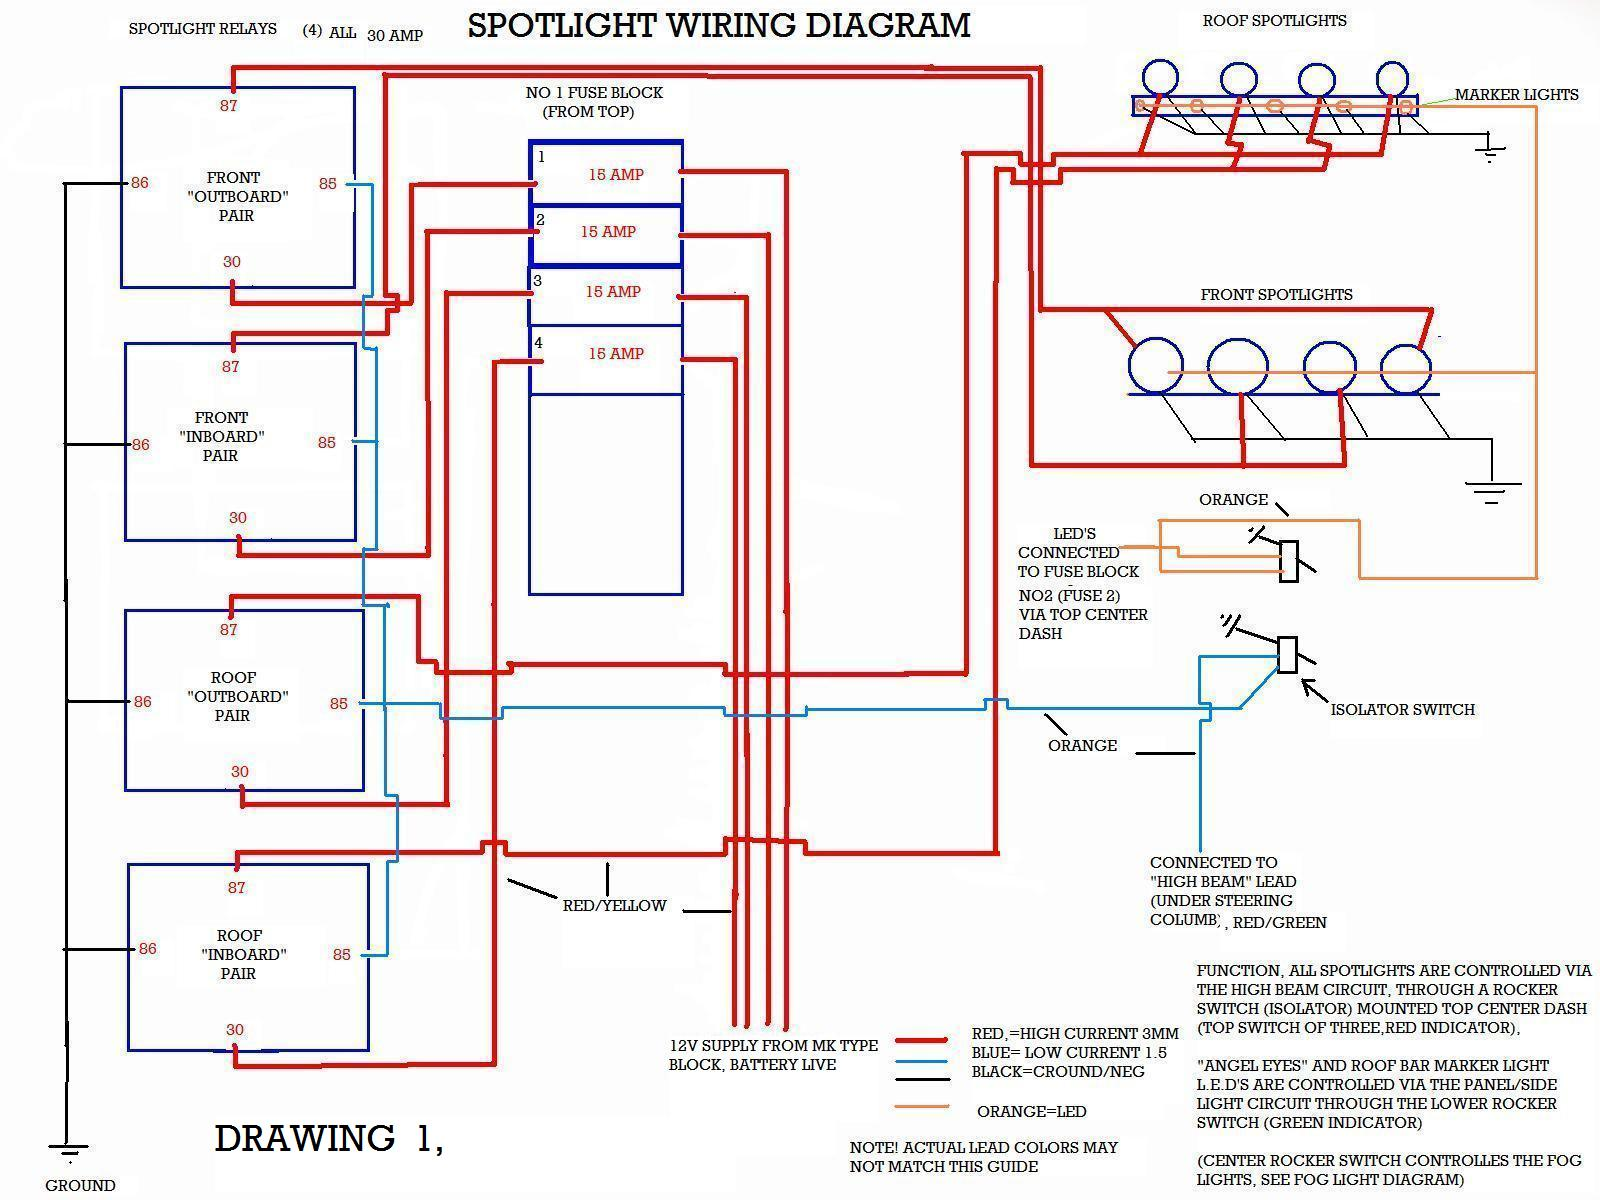 Drawings - Hilux Surf & 4Runner forum | Spotlight Wiring Diagram For Hilux |  | Hilux Surf Forum